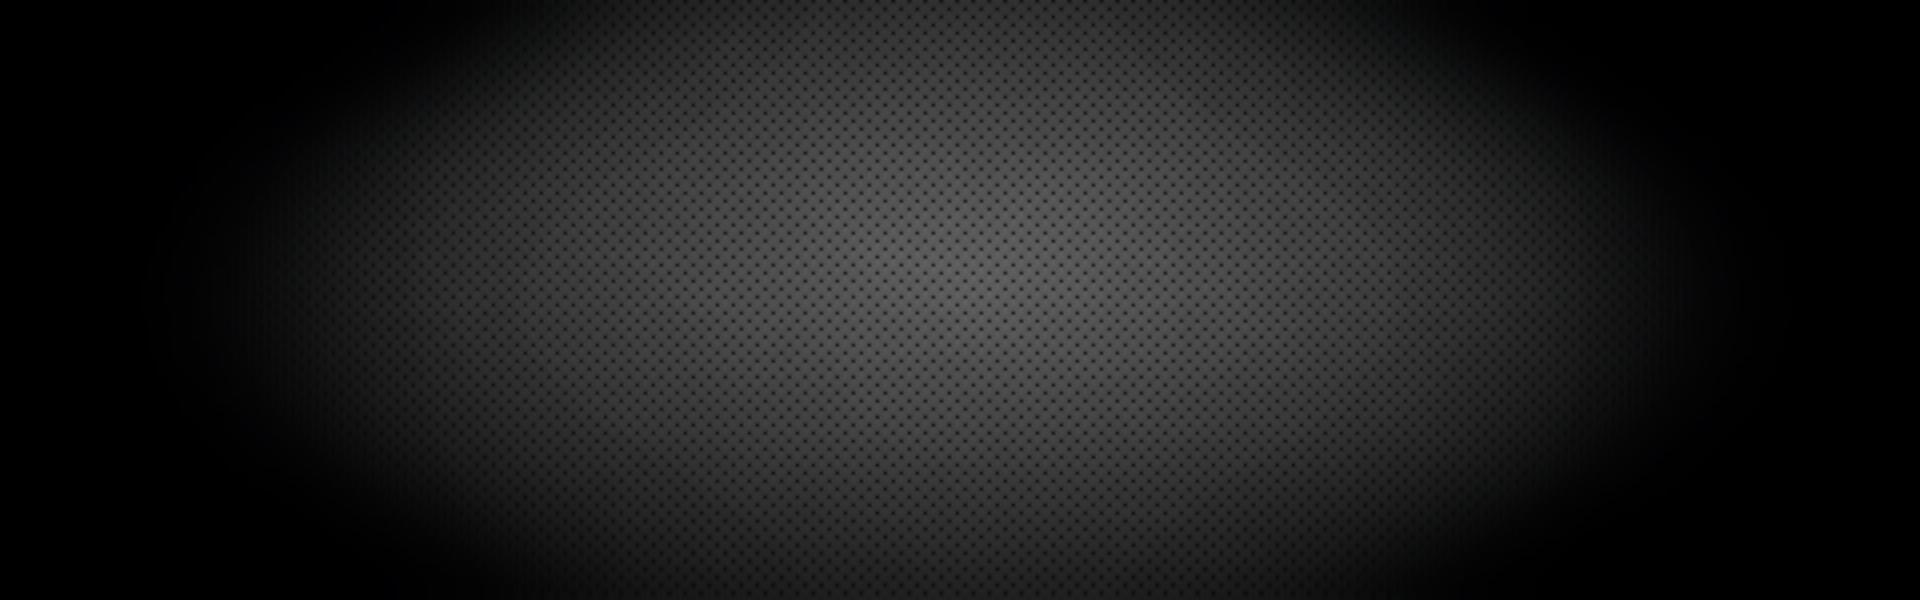 gray_background-eff